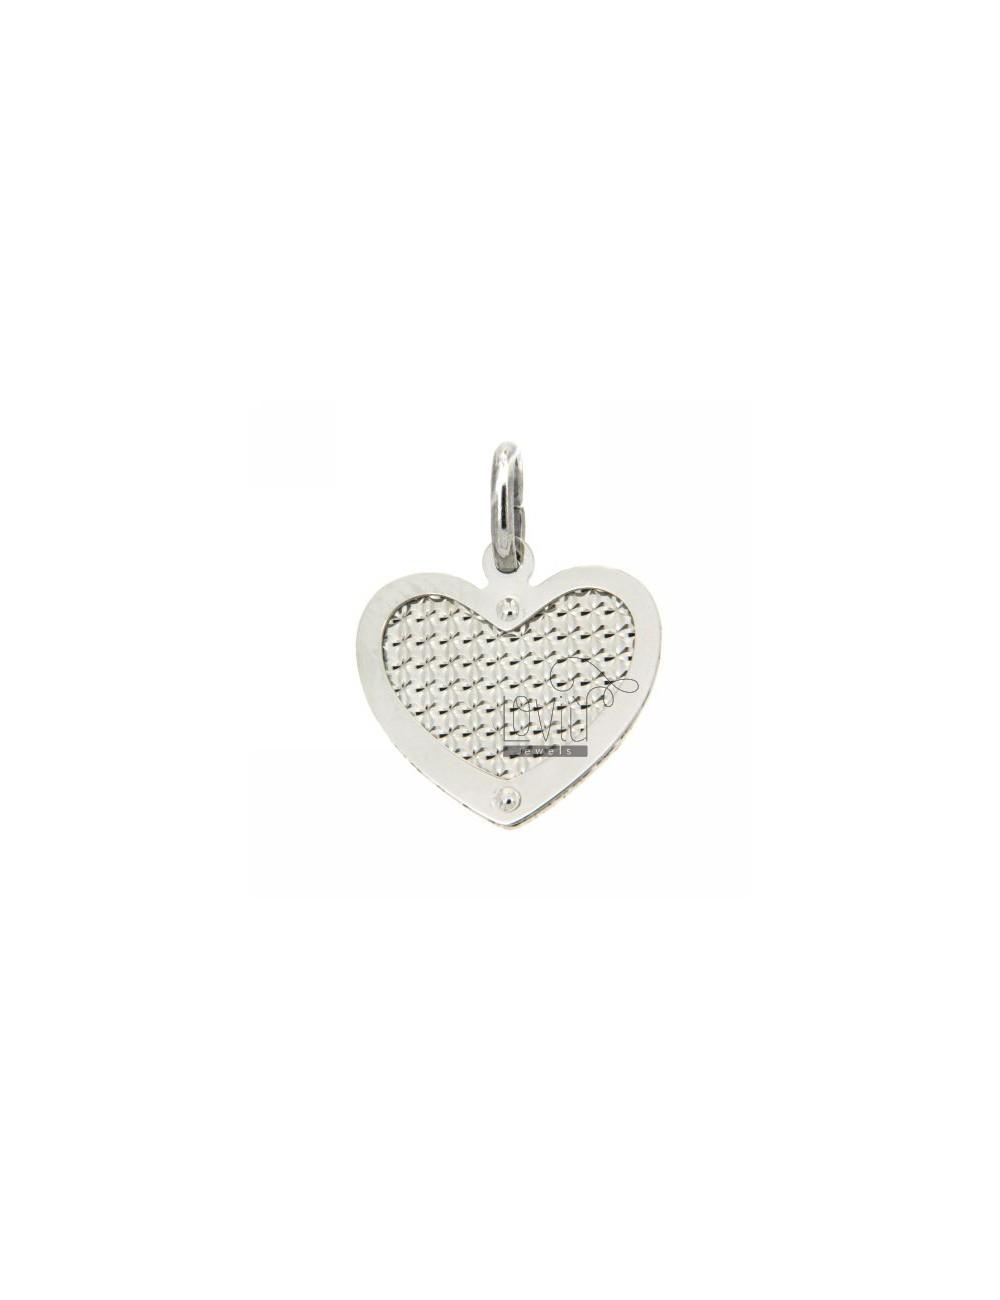 HEART HEART PENDANT WITH RHODIUM SILVER DIAMOND AND INTERNAL 925